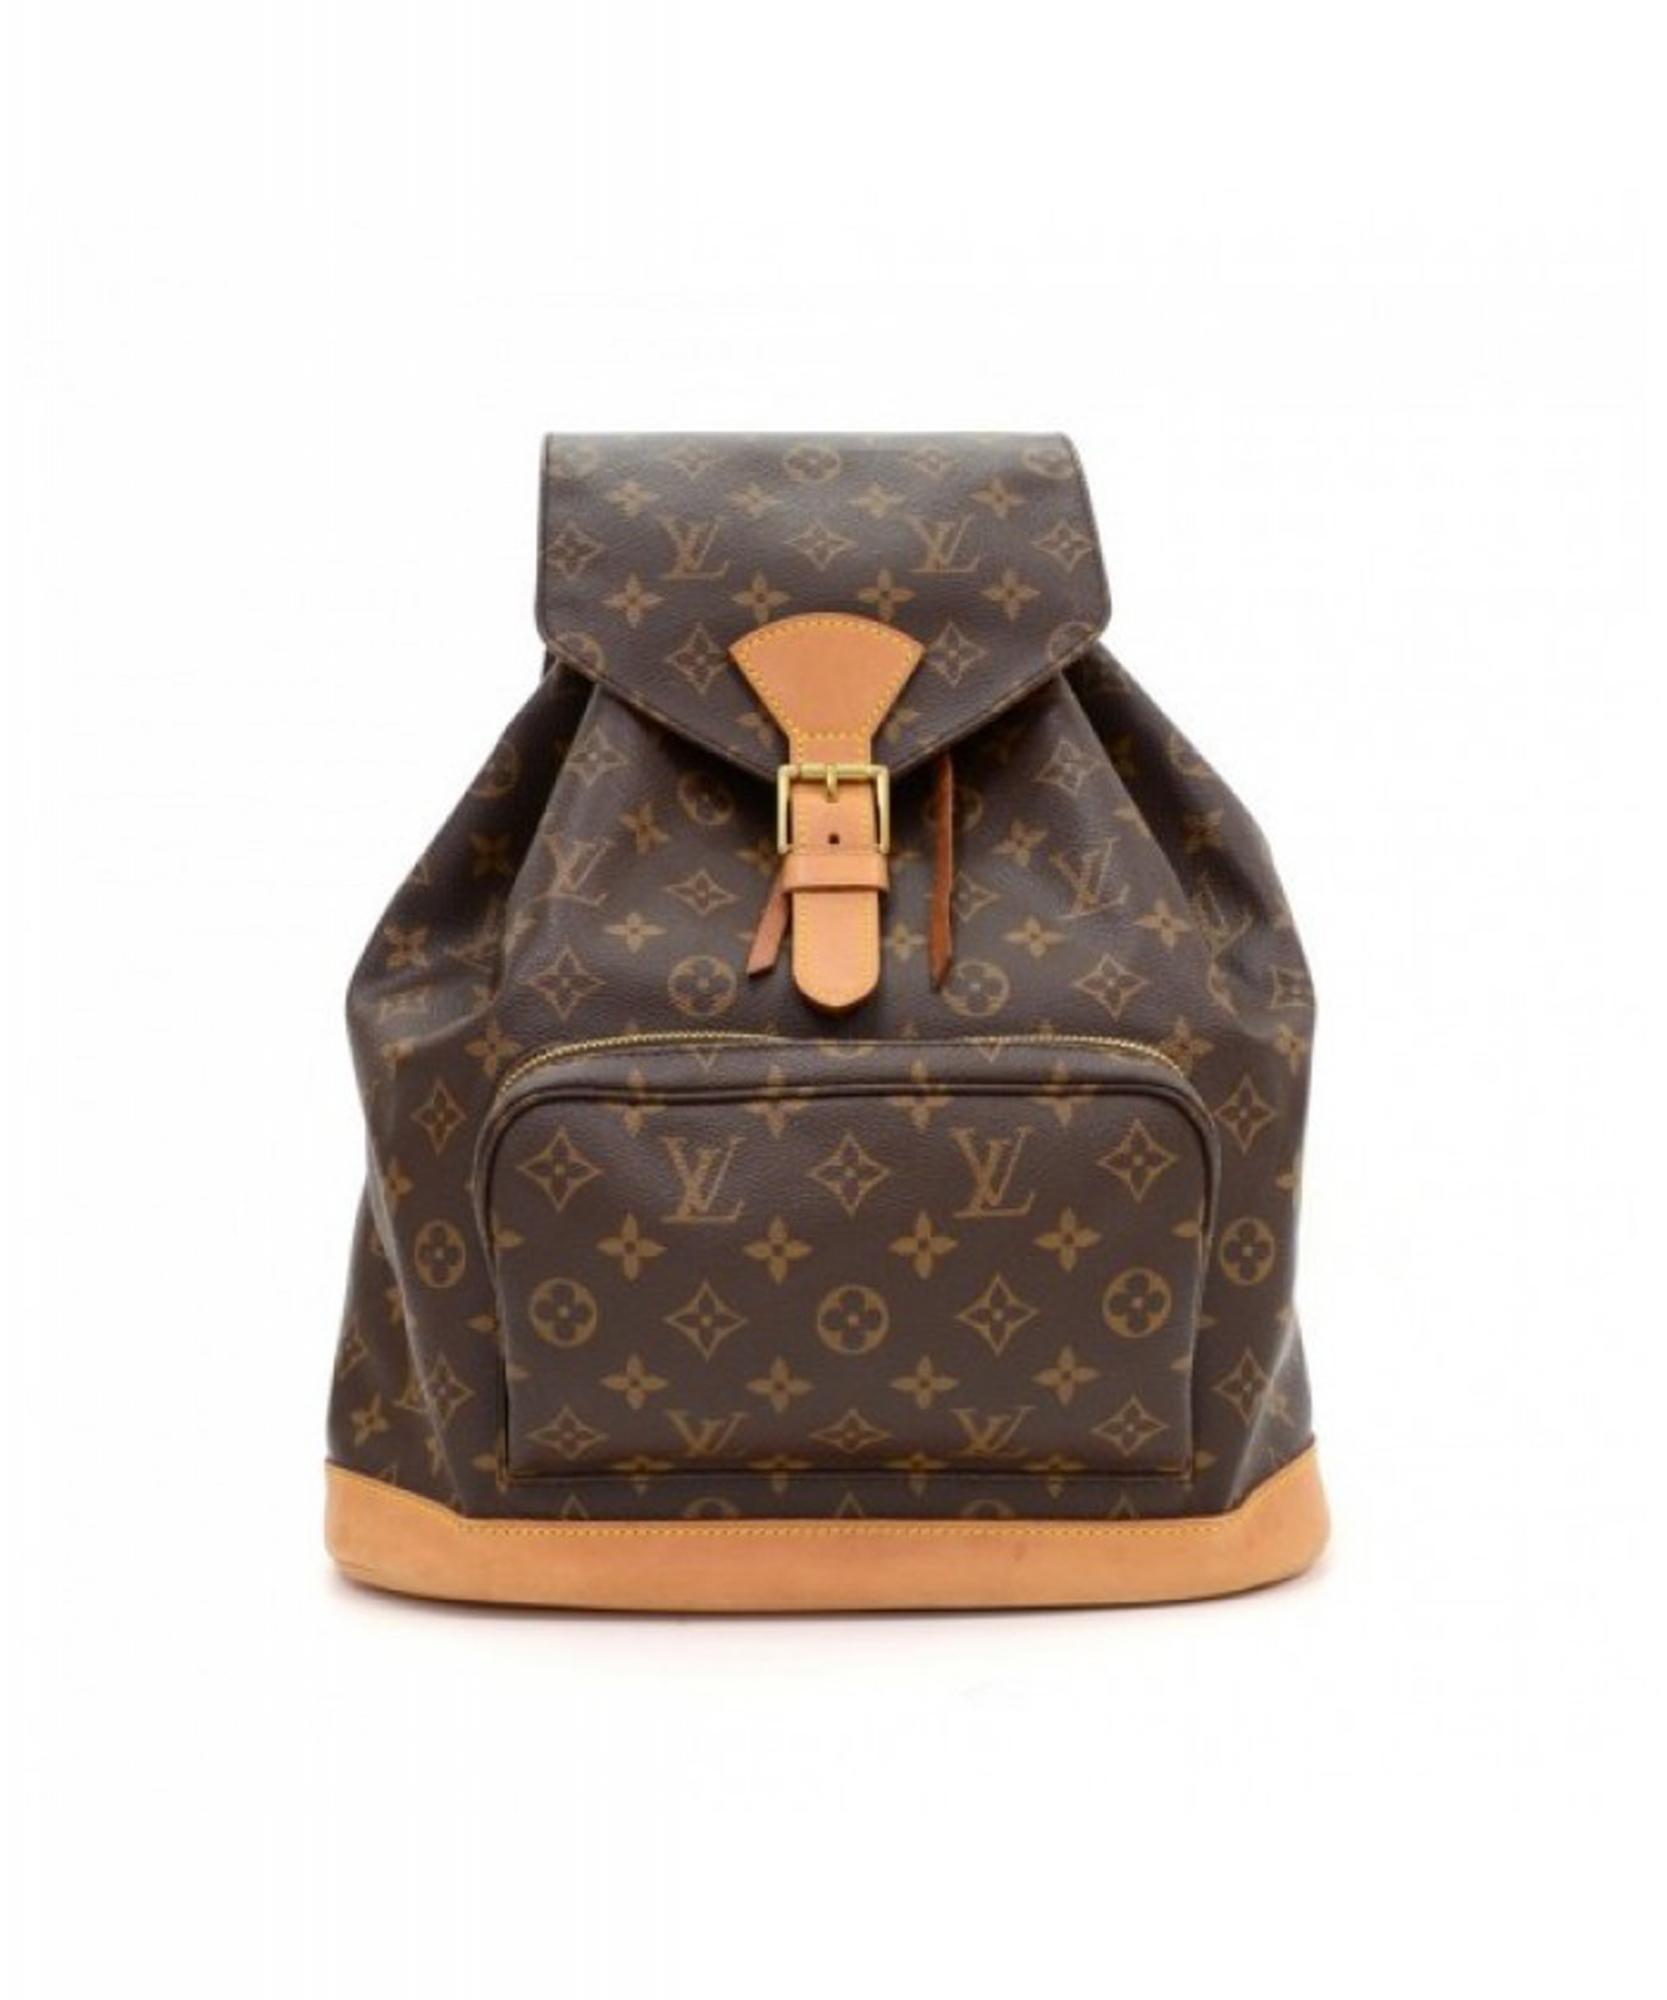 5826baee5e93 Louis Vuitton  Montsouris  GM Monogram Canvas Backpack